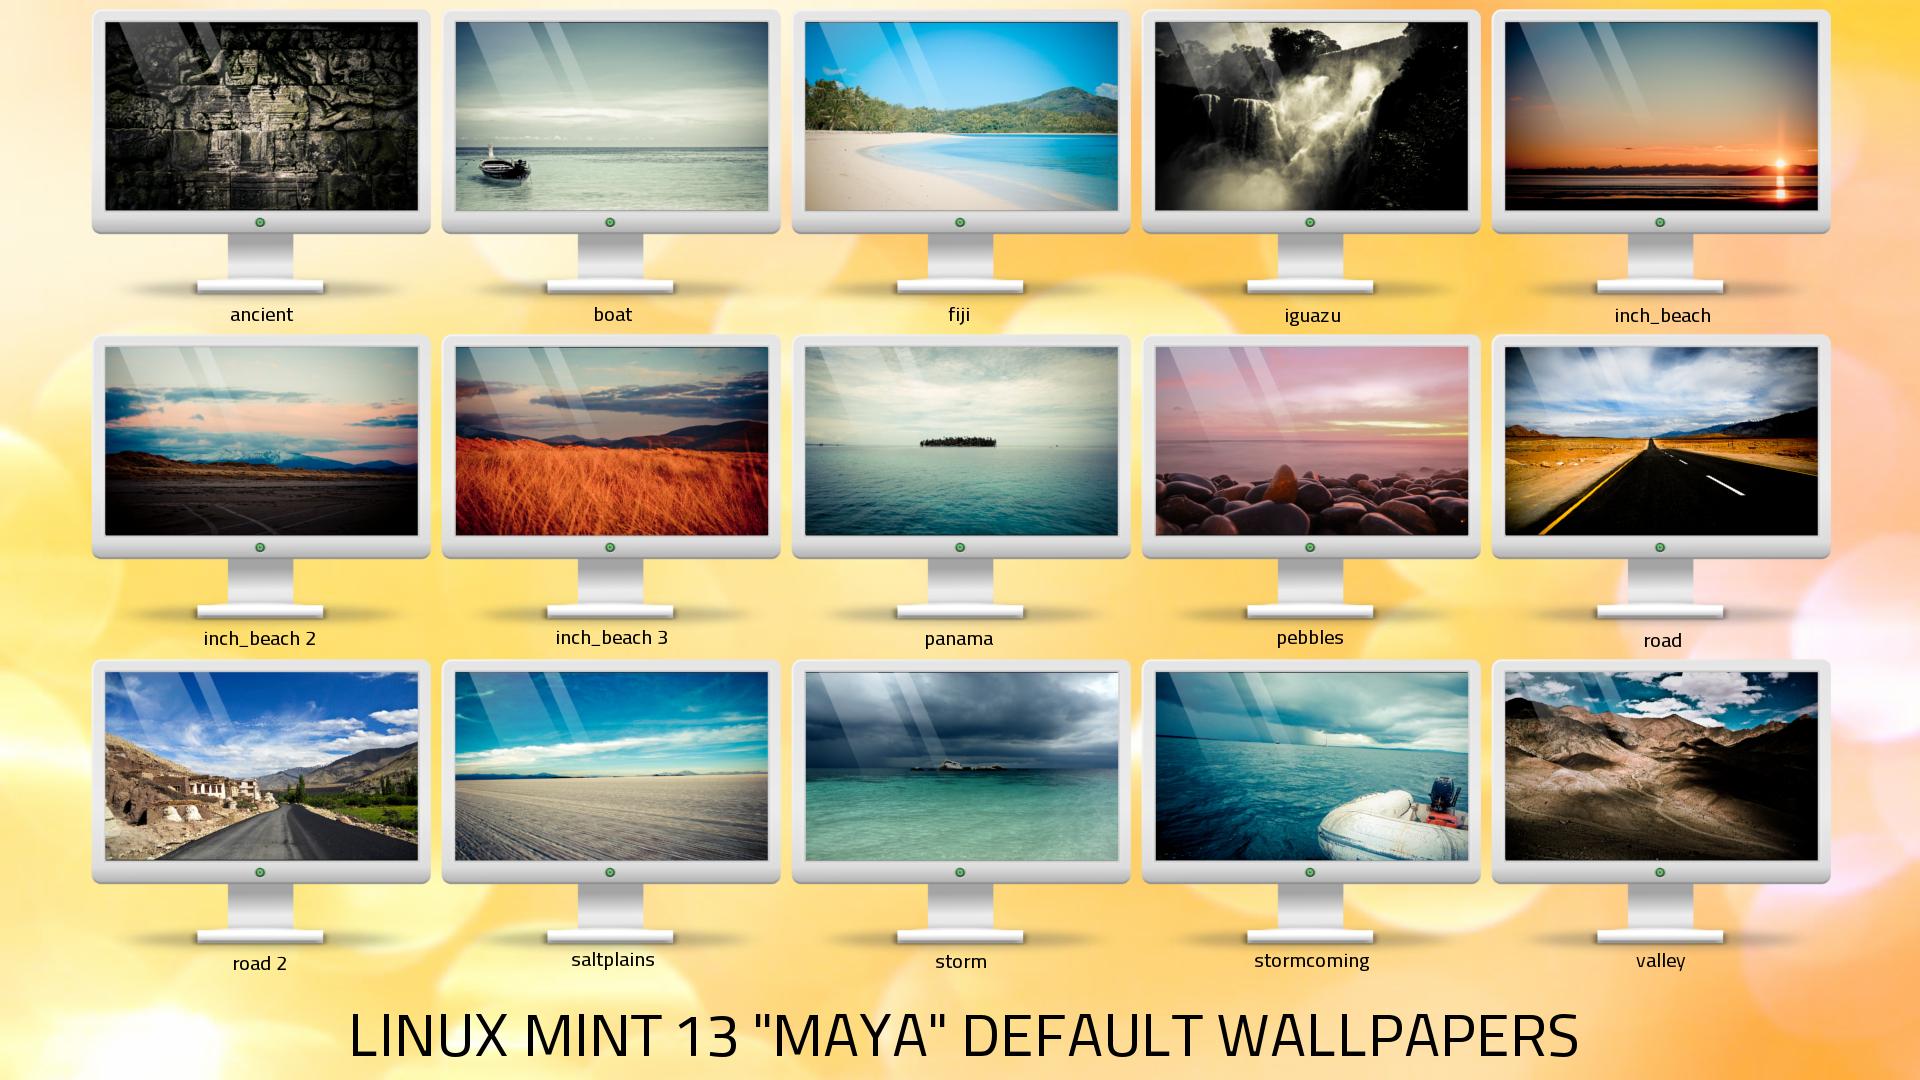 linux mint 13 maya default wallpapers pack